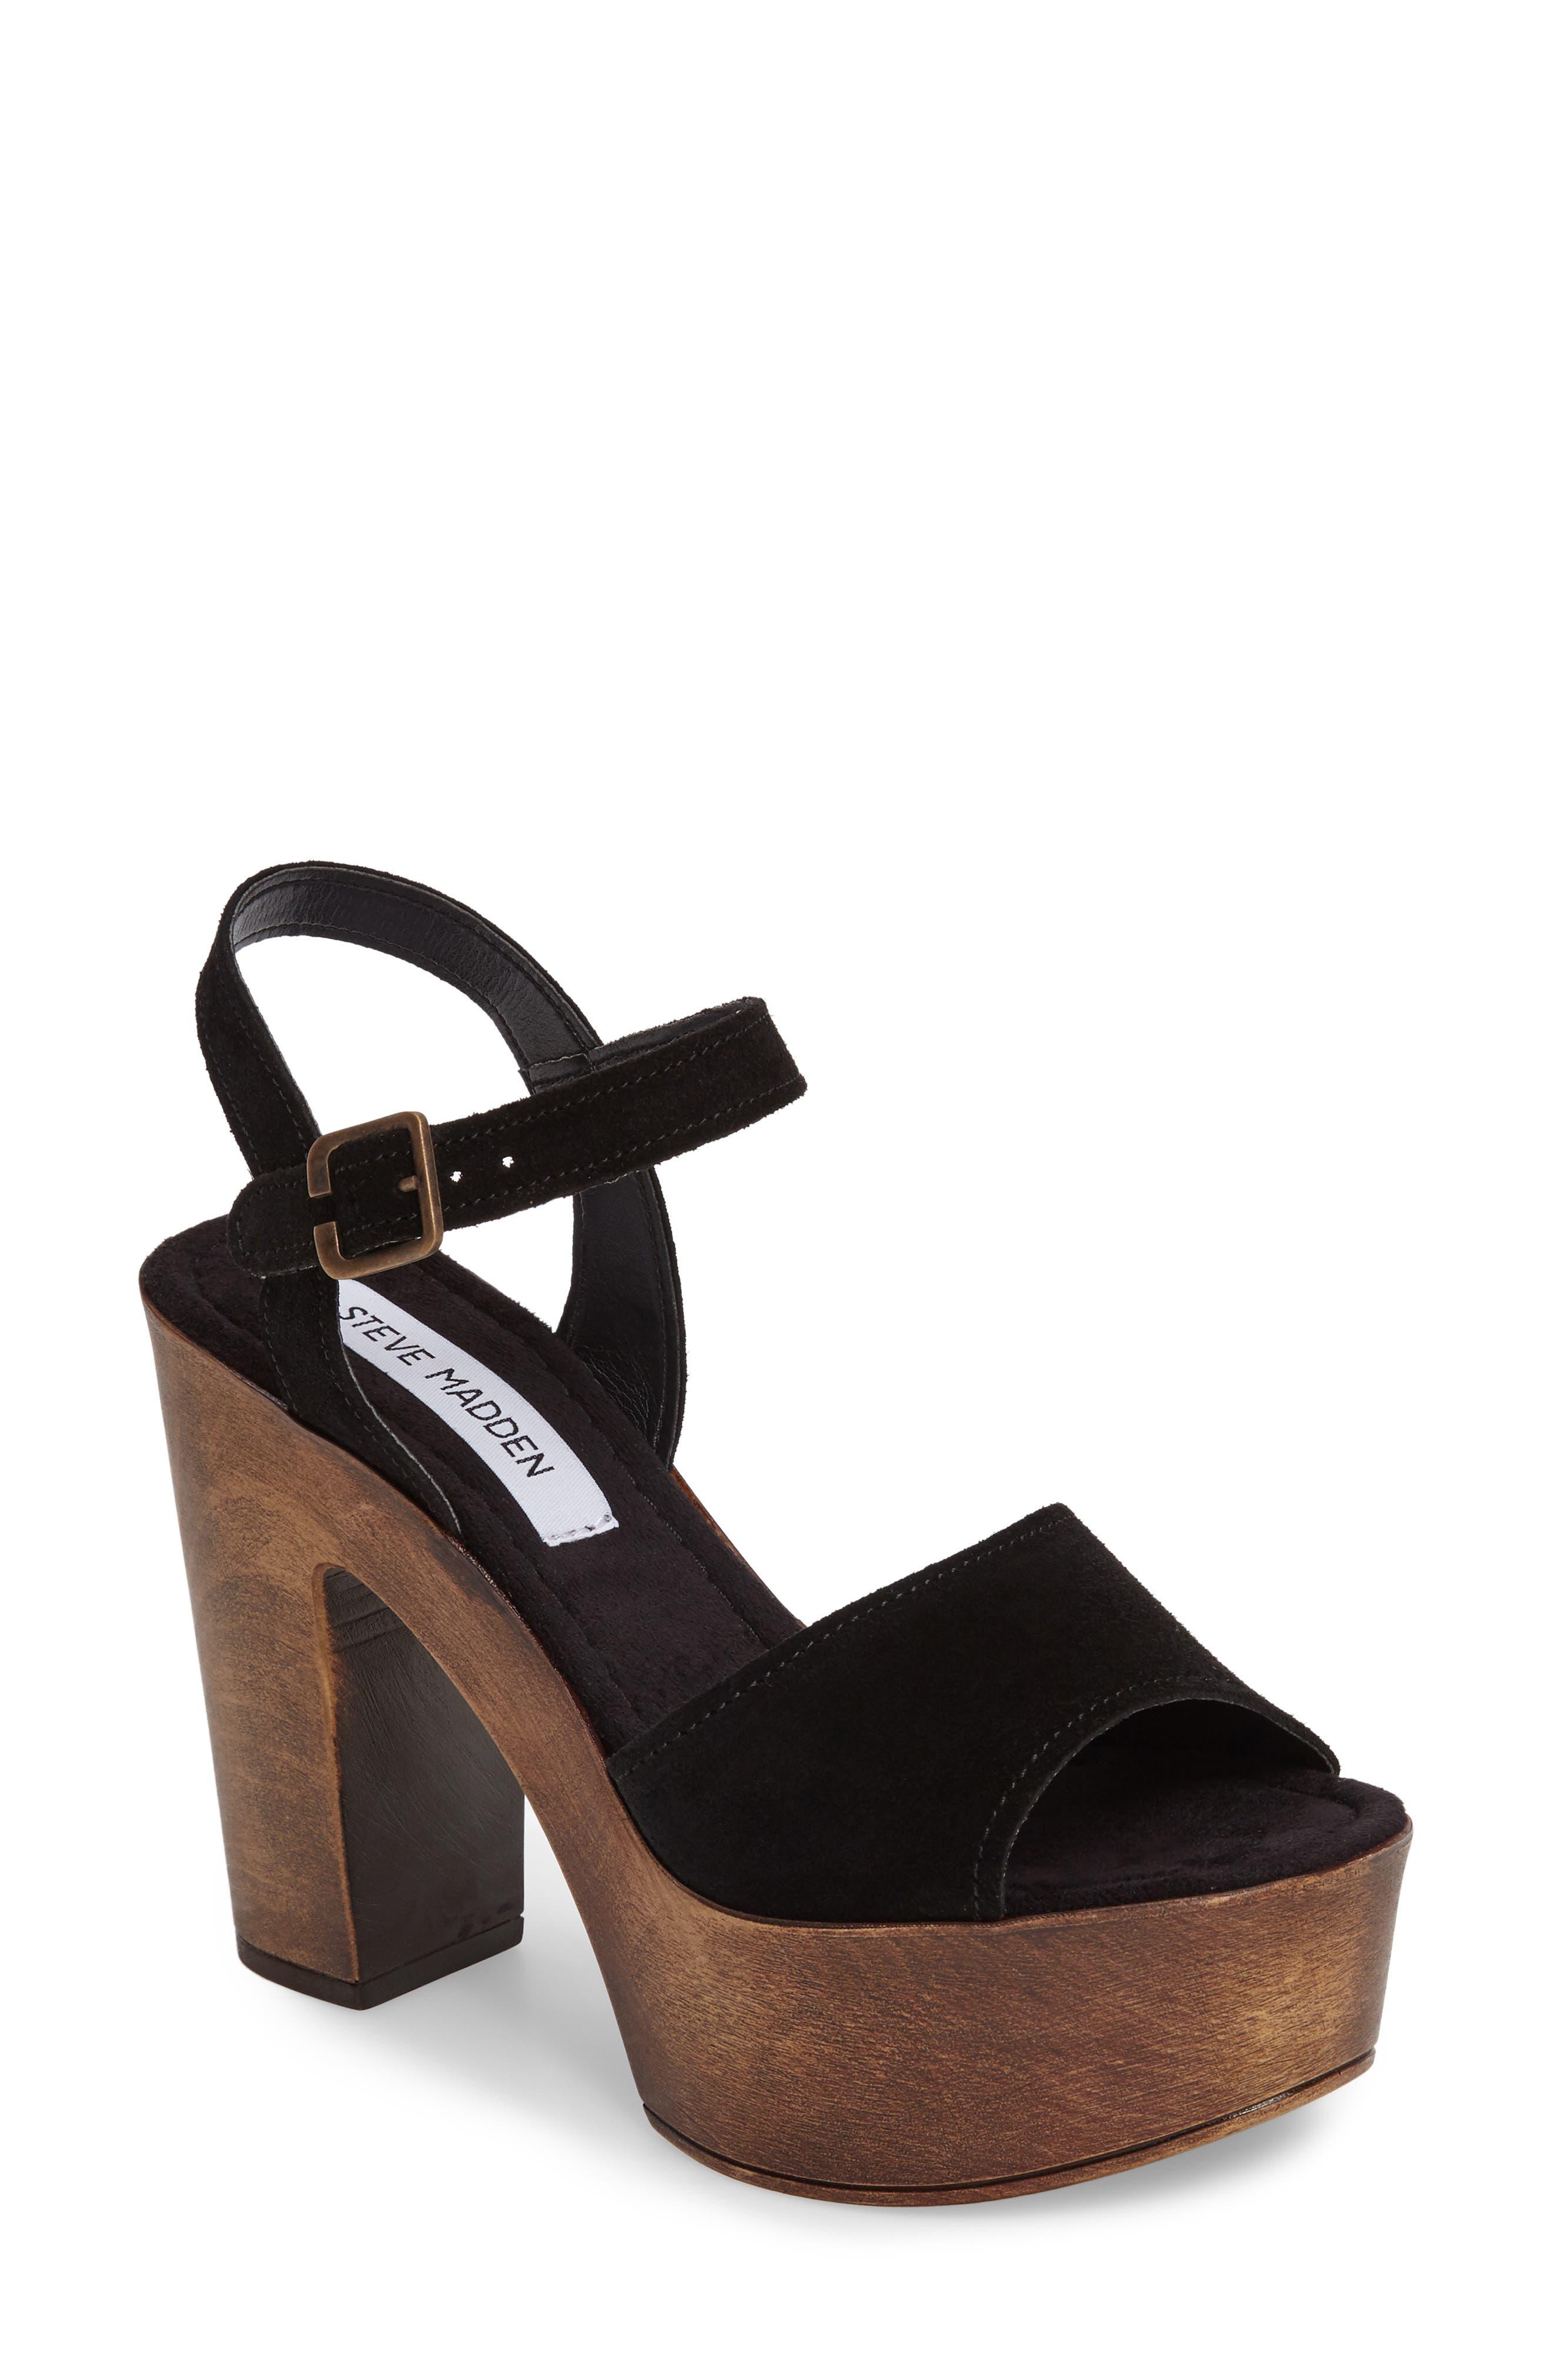 Lulla Platform Sandal,                             Main thumbnail 1, color,                             Black Suede